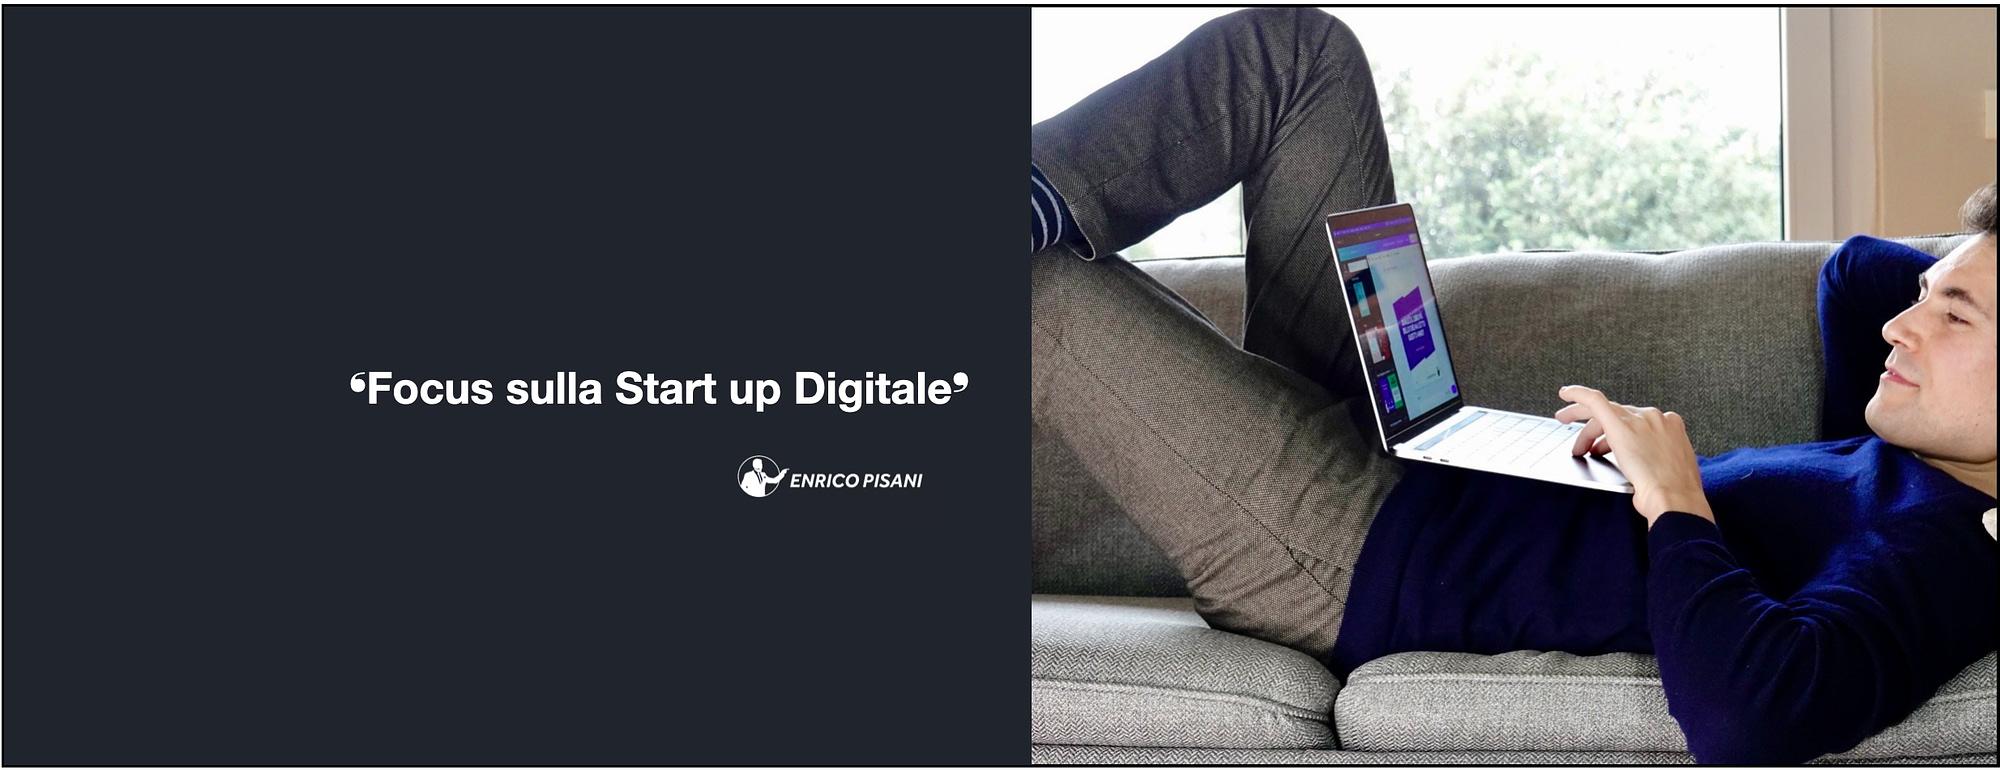 Enrico pisani Startup digitale